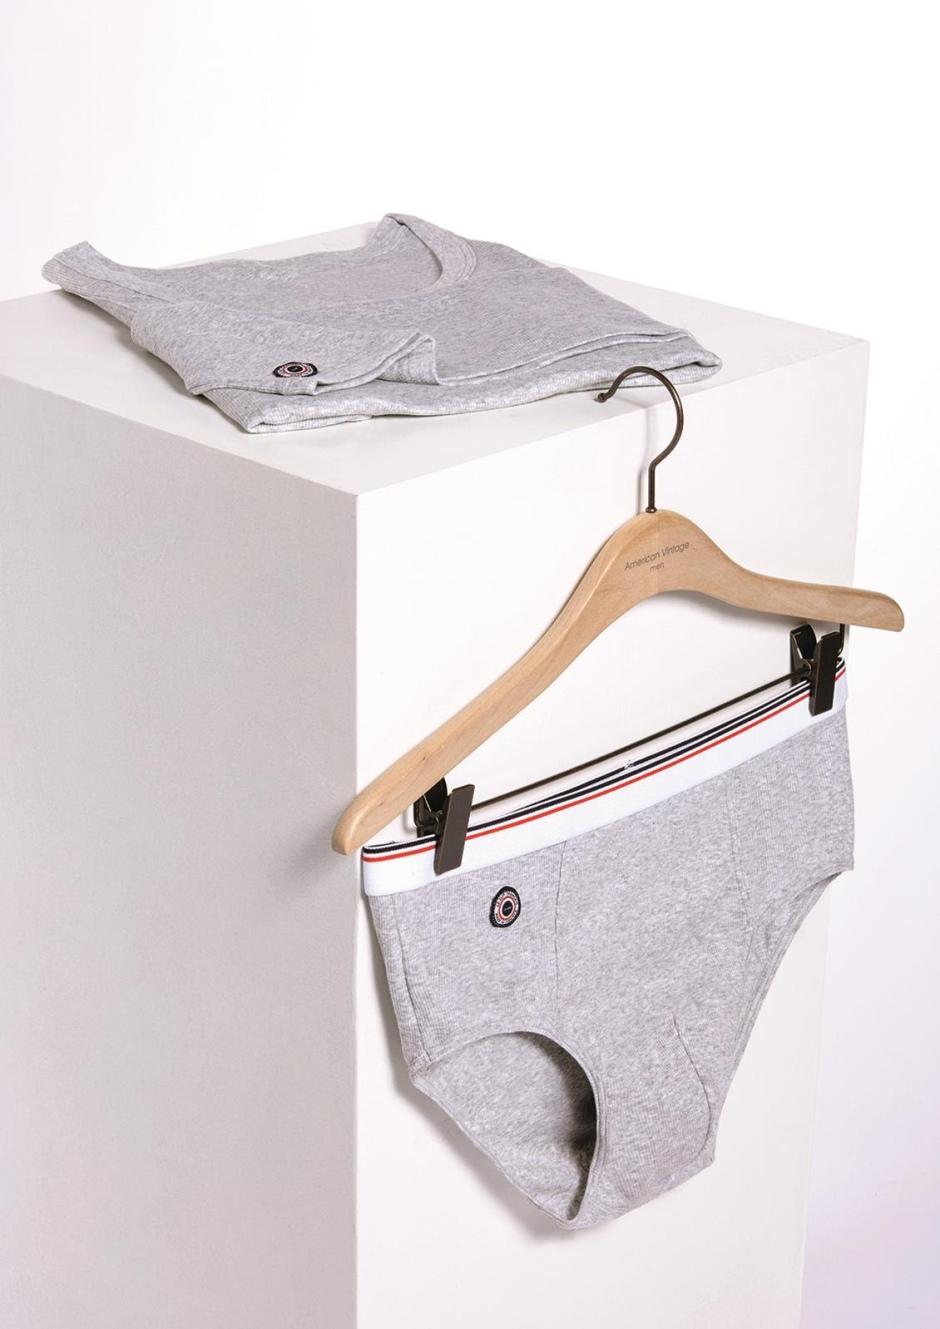 Le Slip Français Men's underwear Boxer 40 €, slip 35 €, tanktop 50 € 96% cotton, 4% elastane